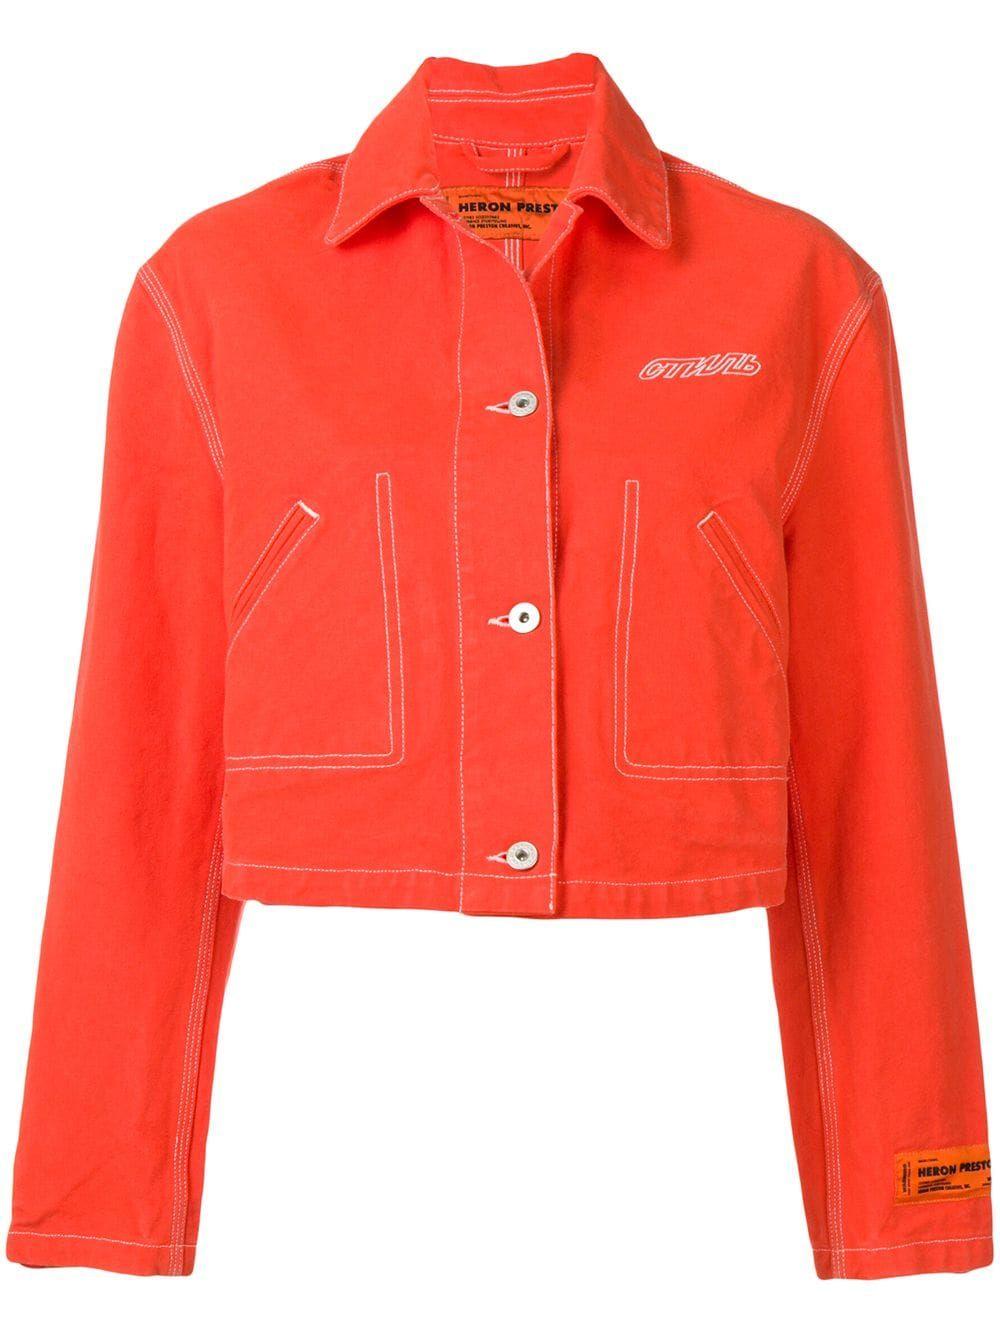 Heron Preston Cropped Denim Jacket Farfetch Cropped Denim Jacket Cropped Denim Jackets [ 1334 x 1000 Pixel ]